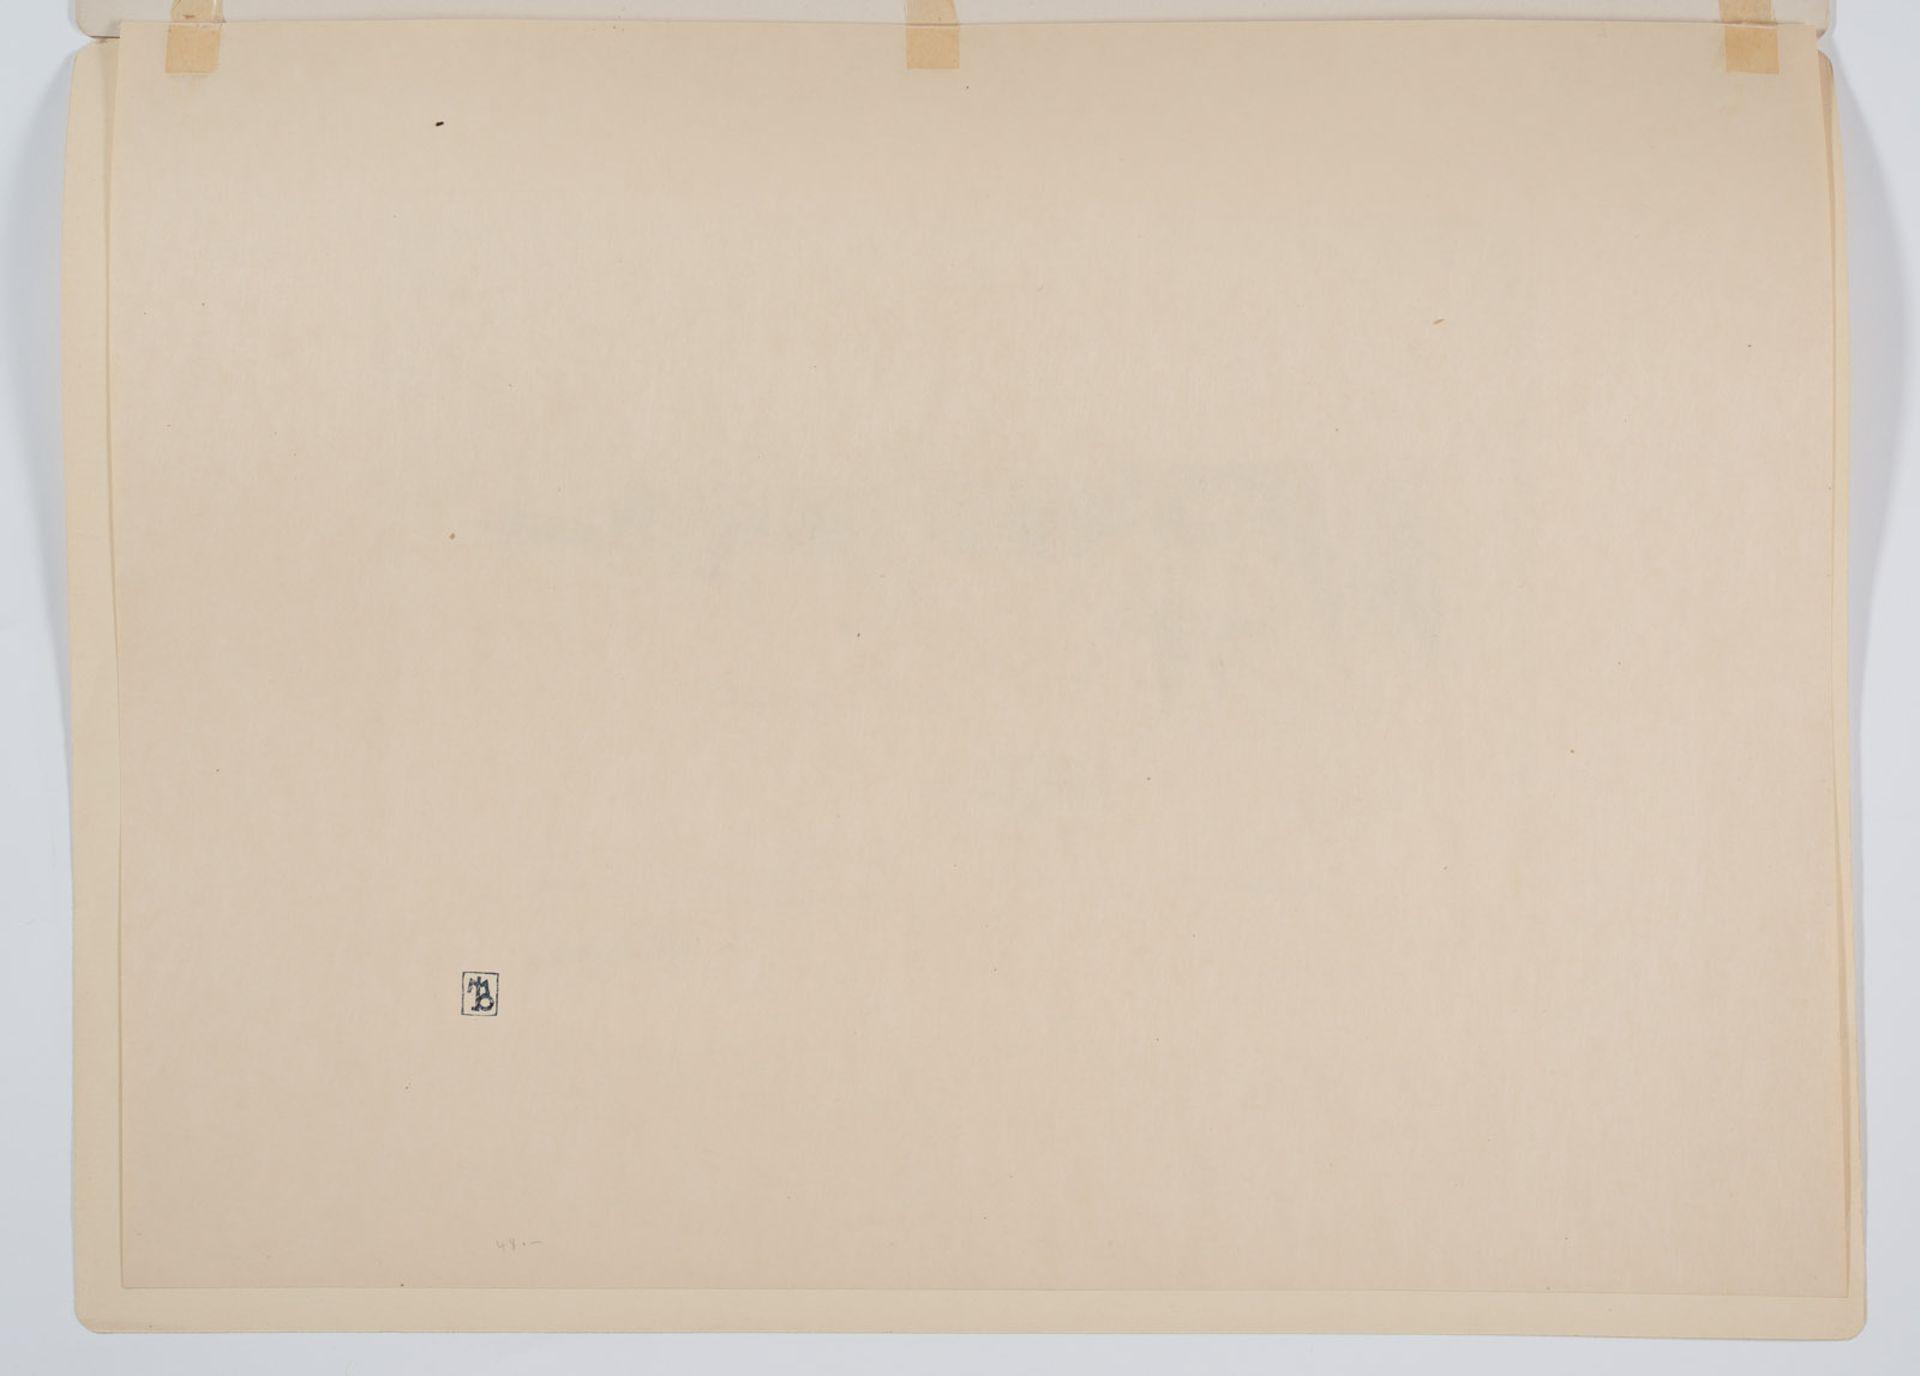 Liebermann, Max - Image 2 of 2